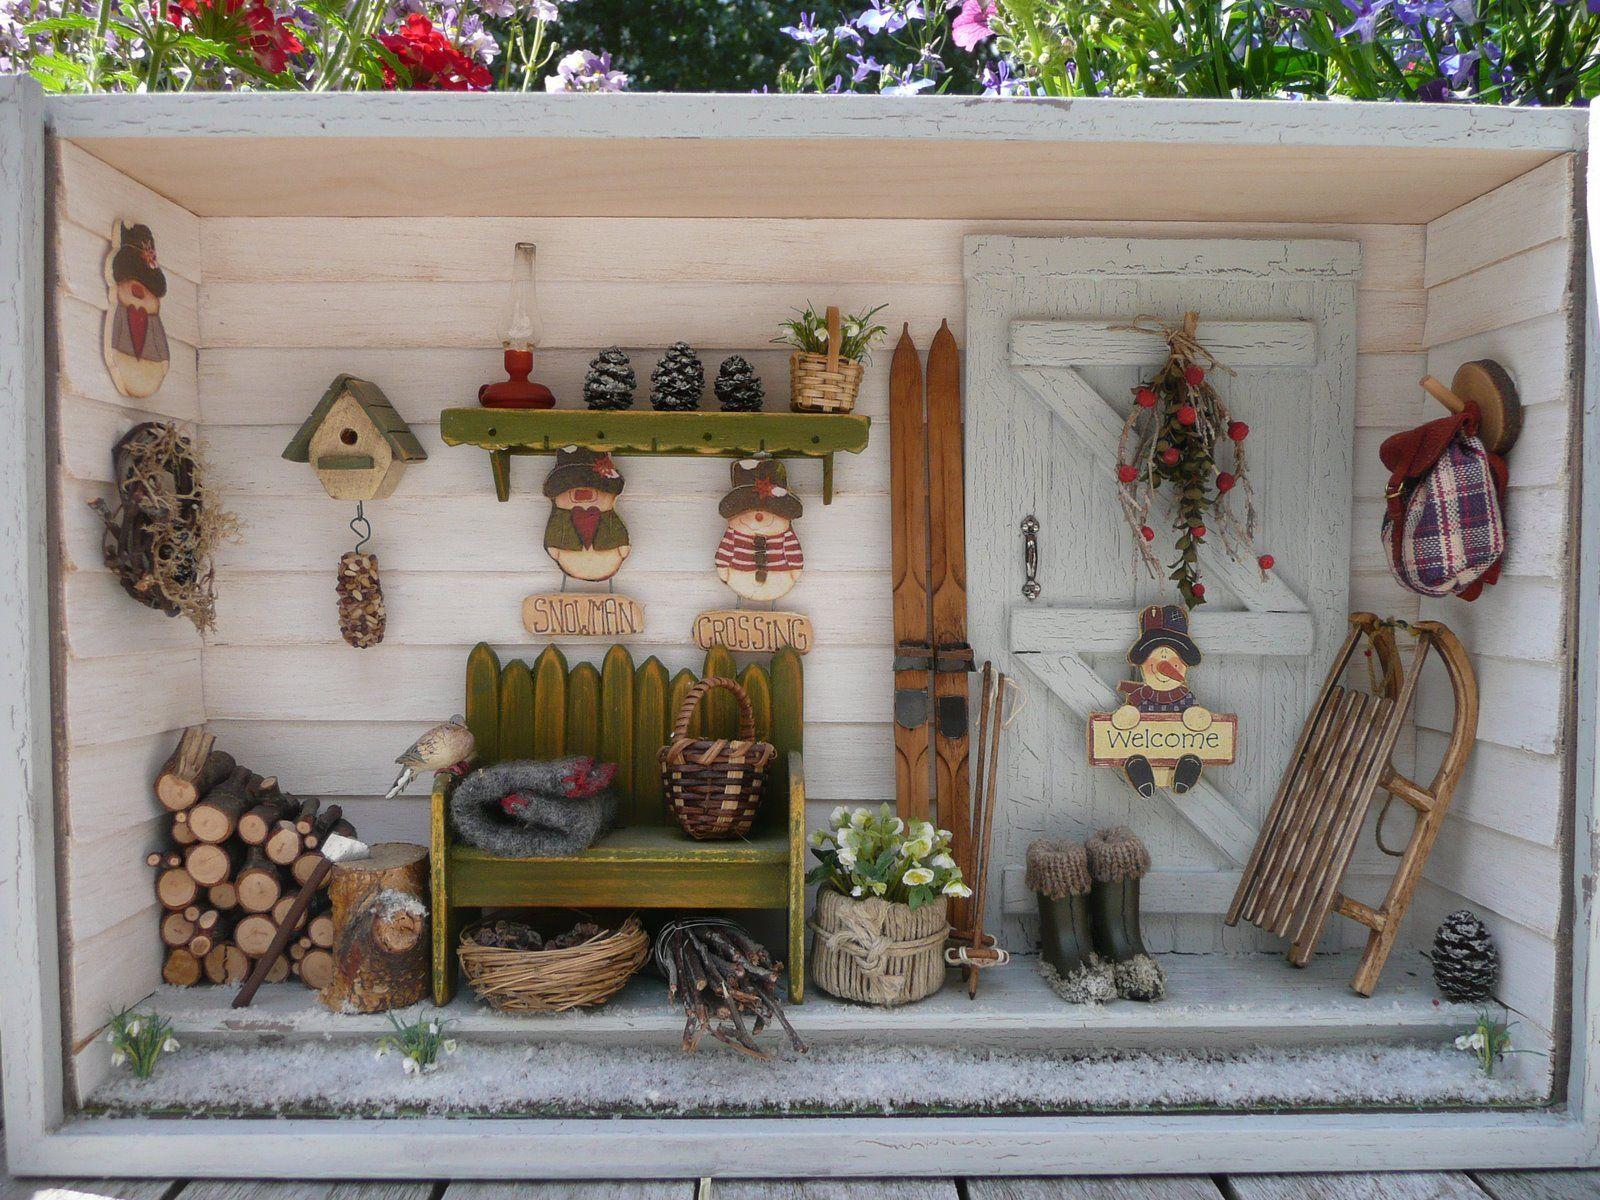 Pin by Mari Maciu on Dollhouse: Balcony | Pinterest | Balconies ...